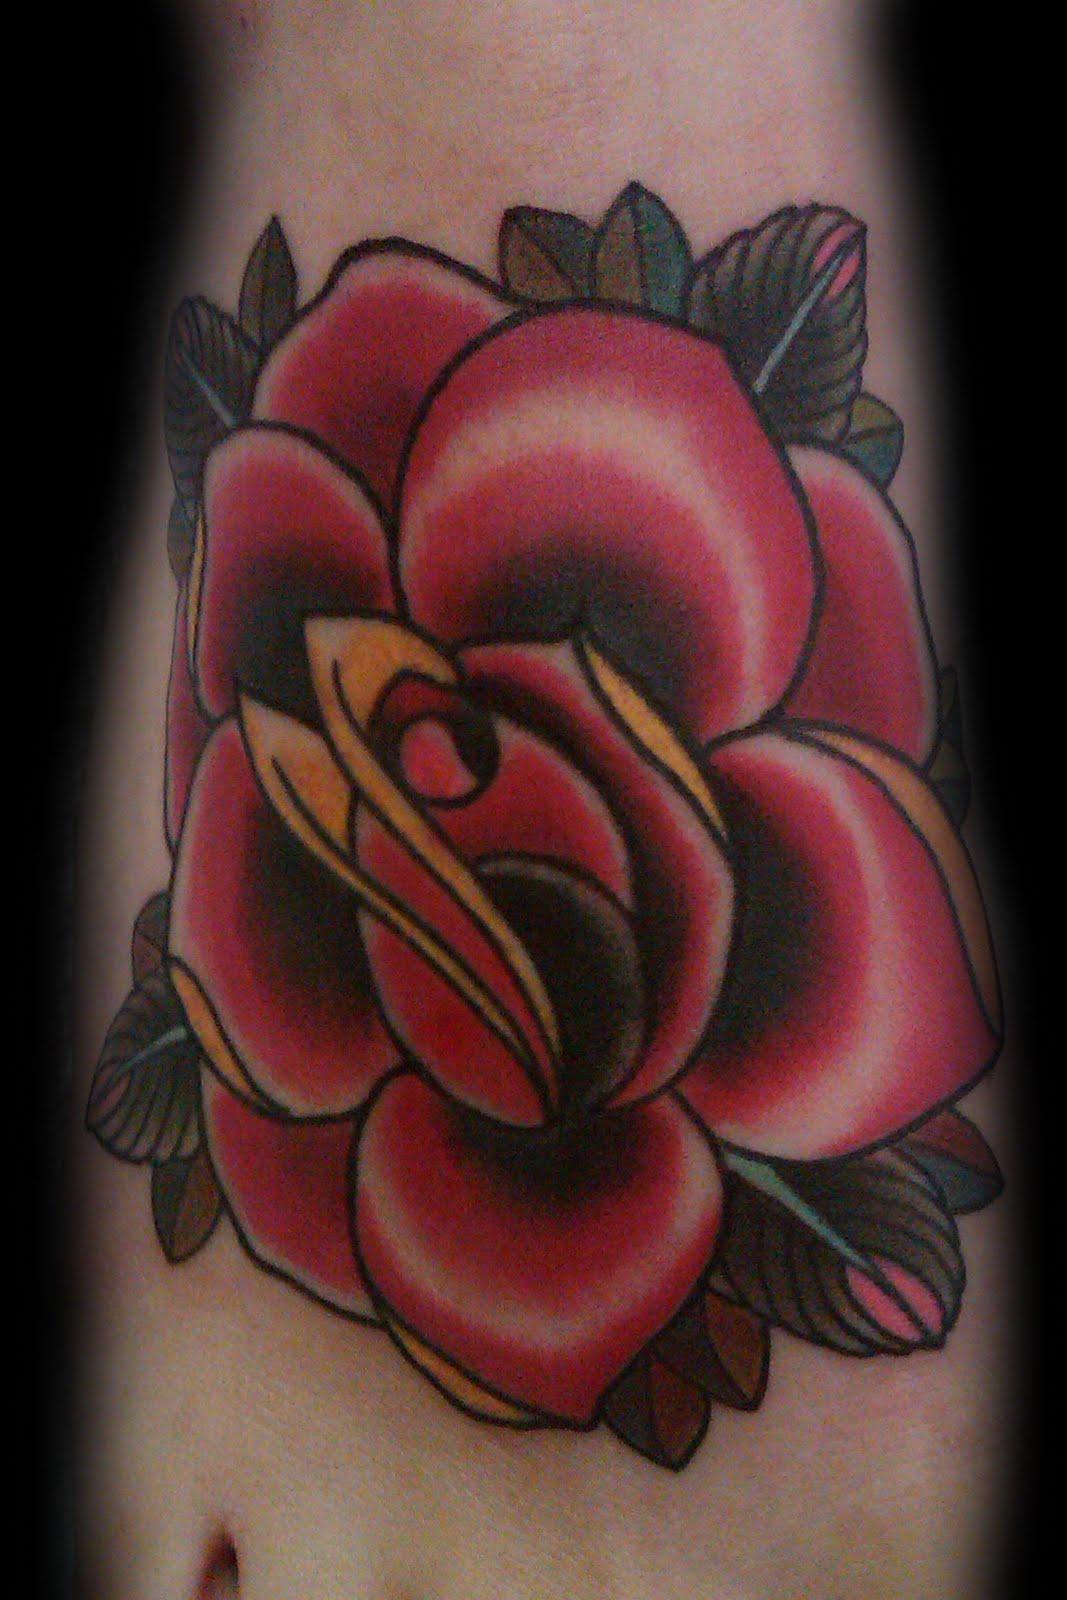 rose tattoo designs for women muhte em tesi d vme tattoo modelleri. Black Bedroom Furniture Sets. Home Design Ideas